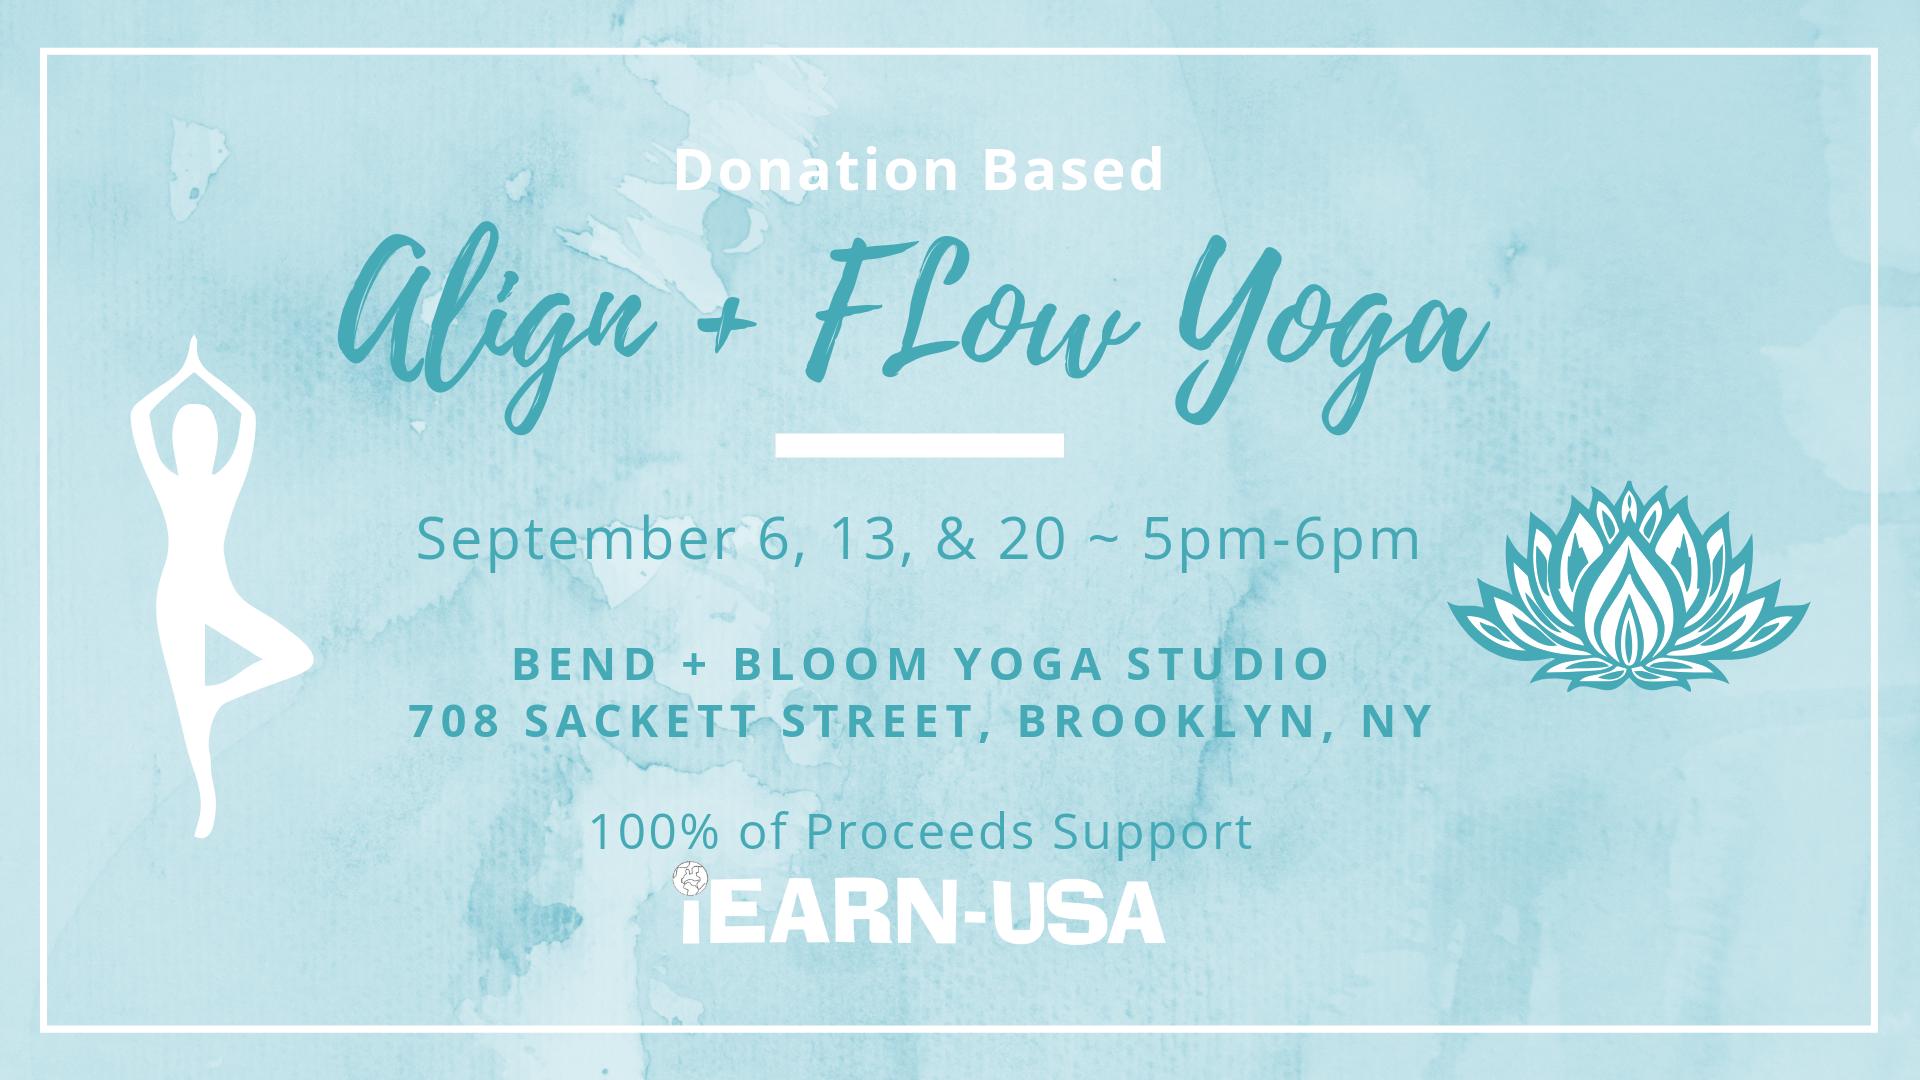 I Earn Usa Yoga Benefit Classes Banner Image